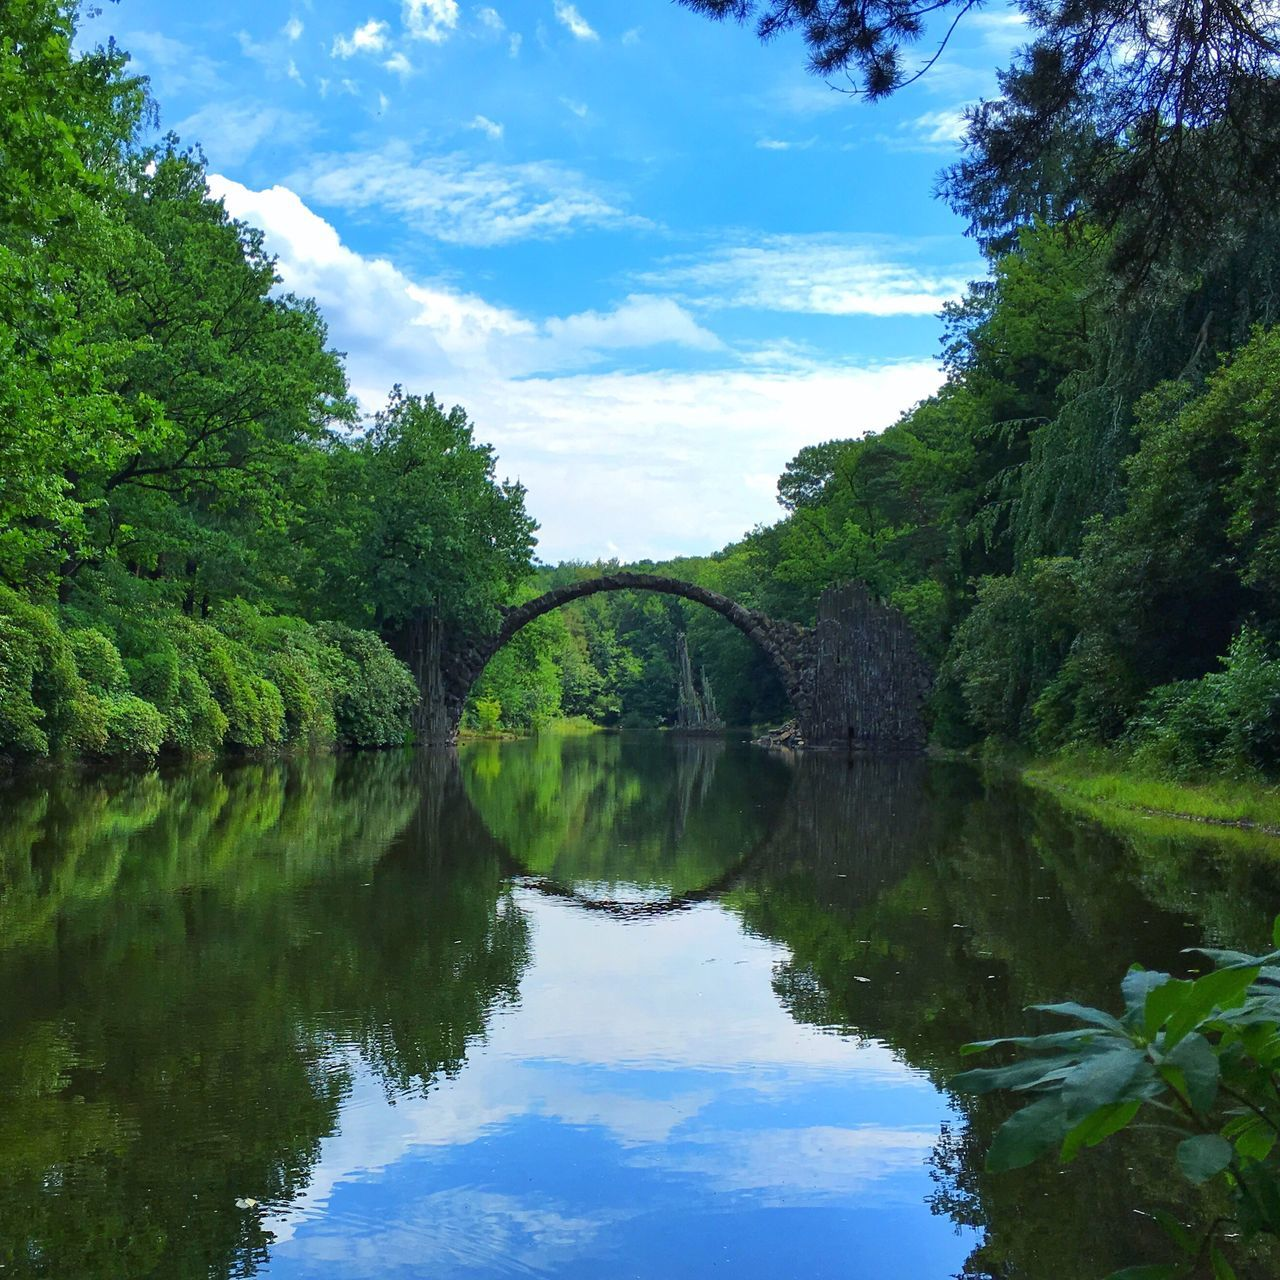 Rakotzbrücke Rakotzbridge Nature Nature Photography Bridge Water Reflections